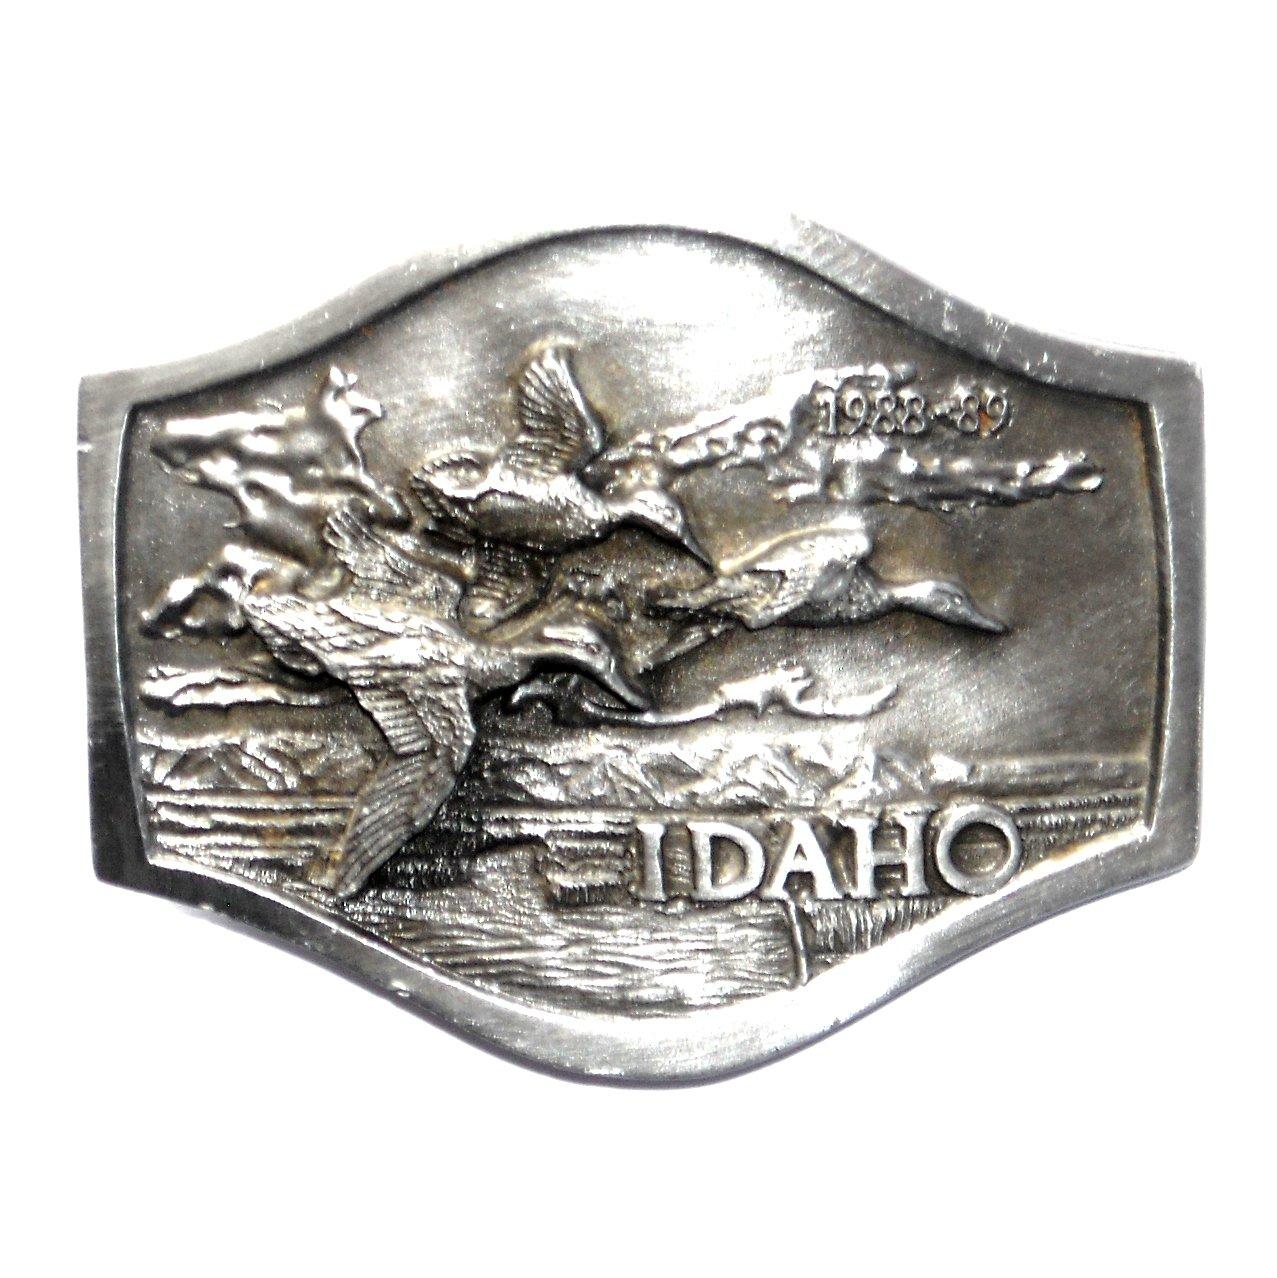 Idaho department fish and game 3d bergamot pewter belt buckle for Idaho department of fish and game